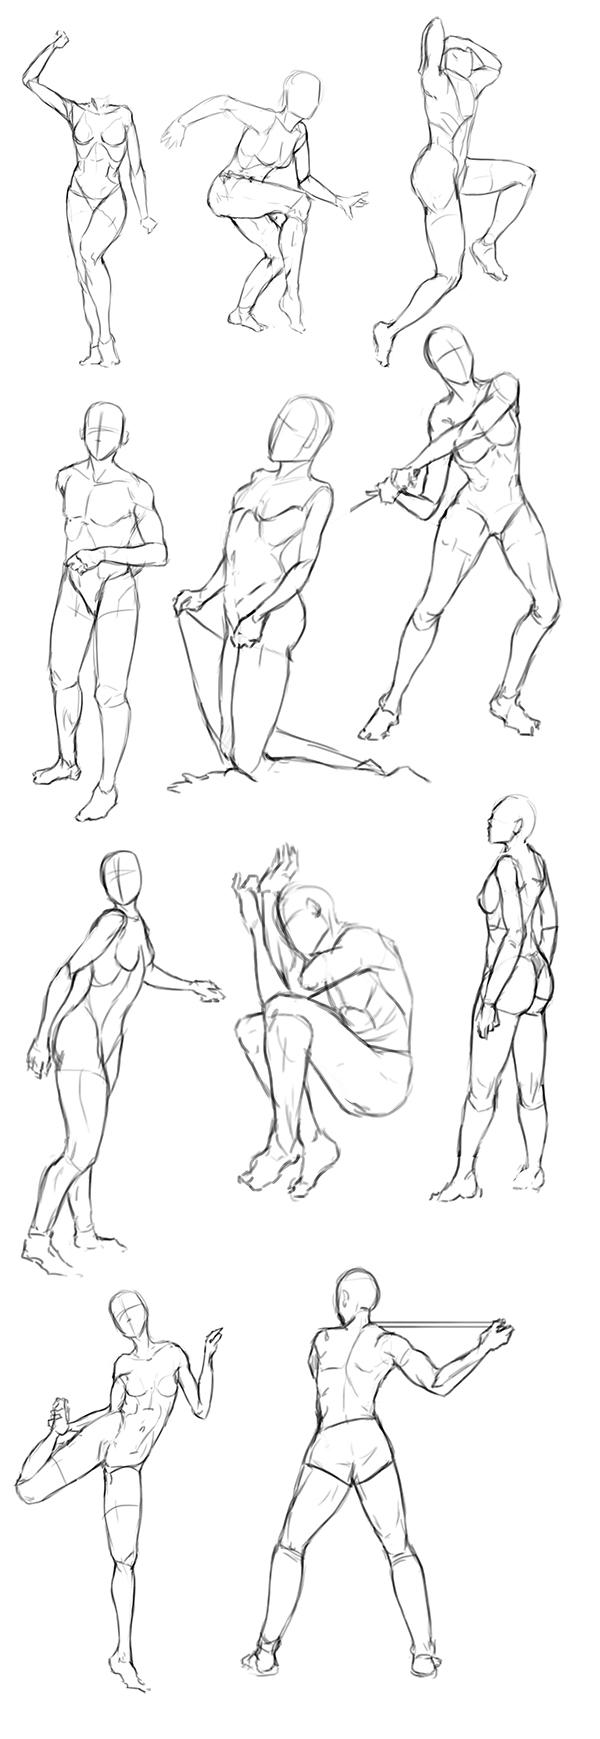 Gesture Studies 5 by EduardoGaray